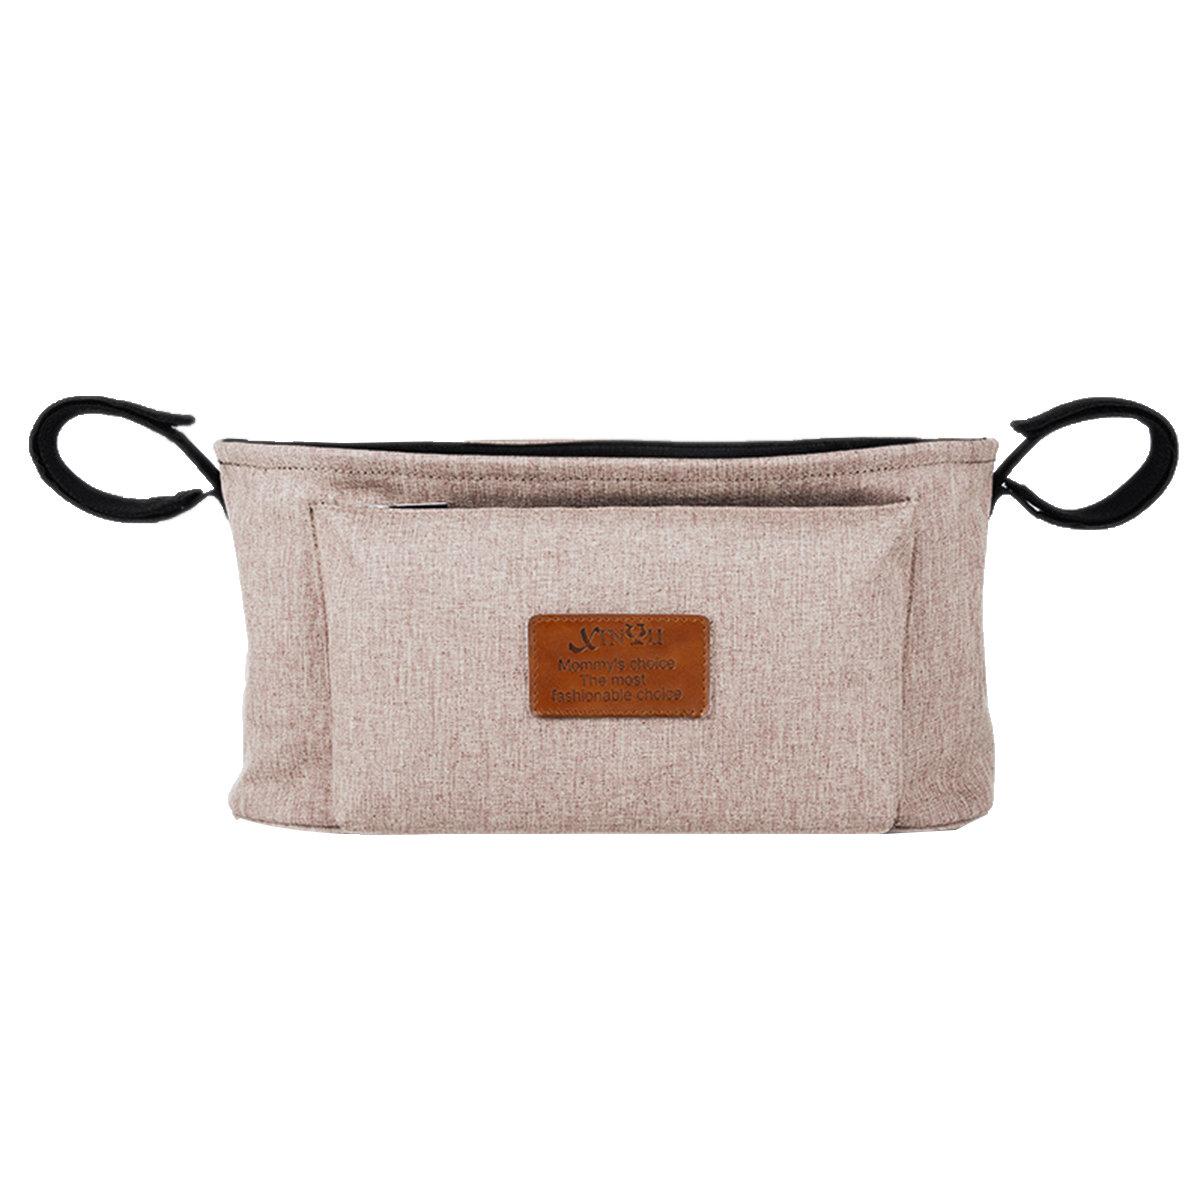 Stroller Organizer Baby Basket Pushchair Travel Diaper Nappies Storage Bag